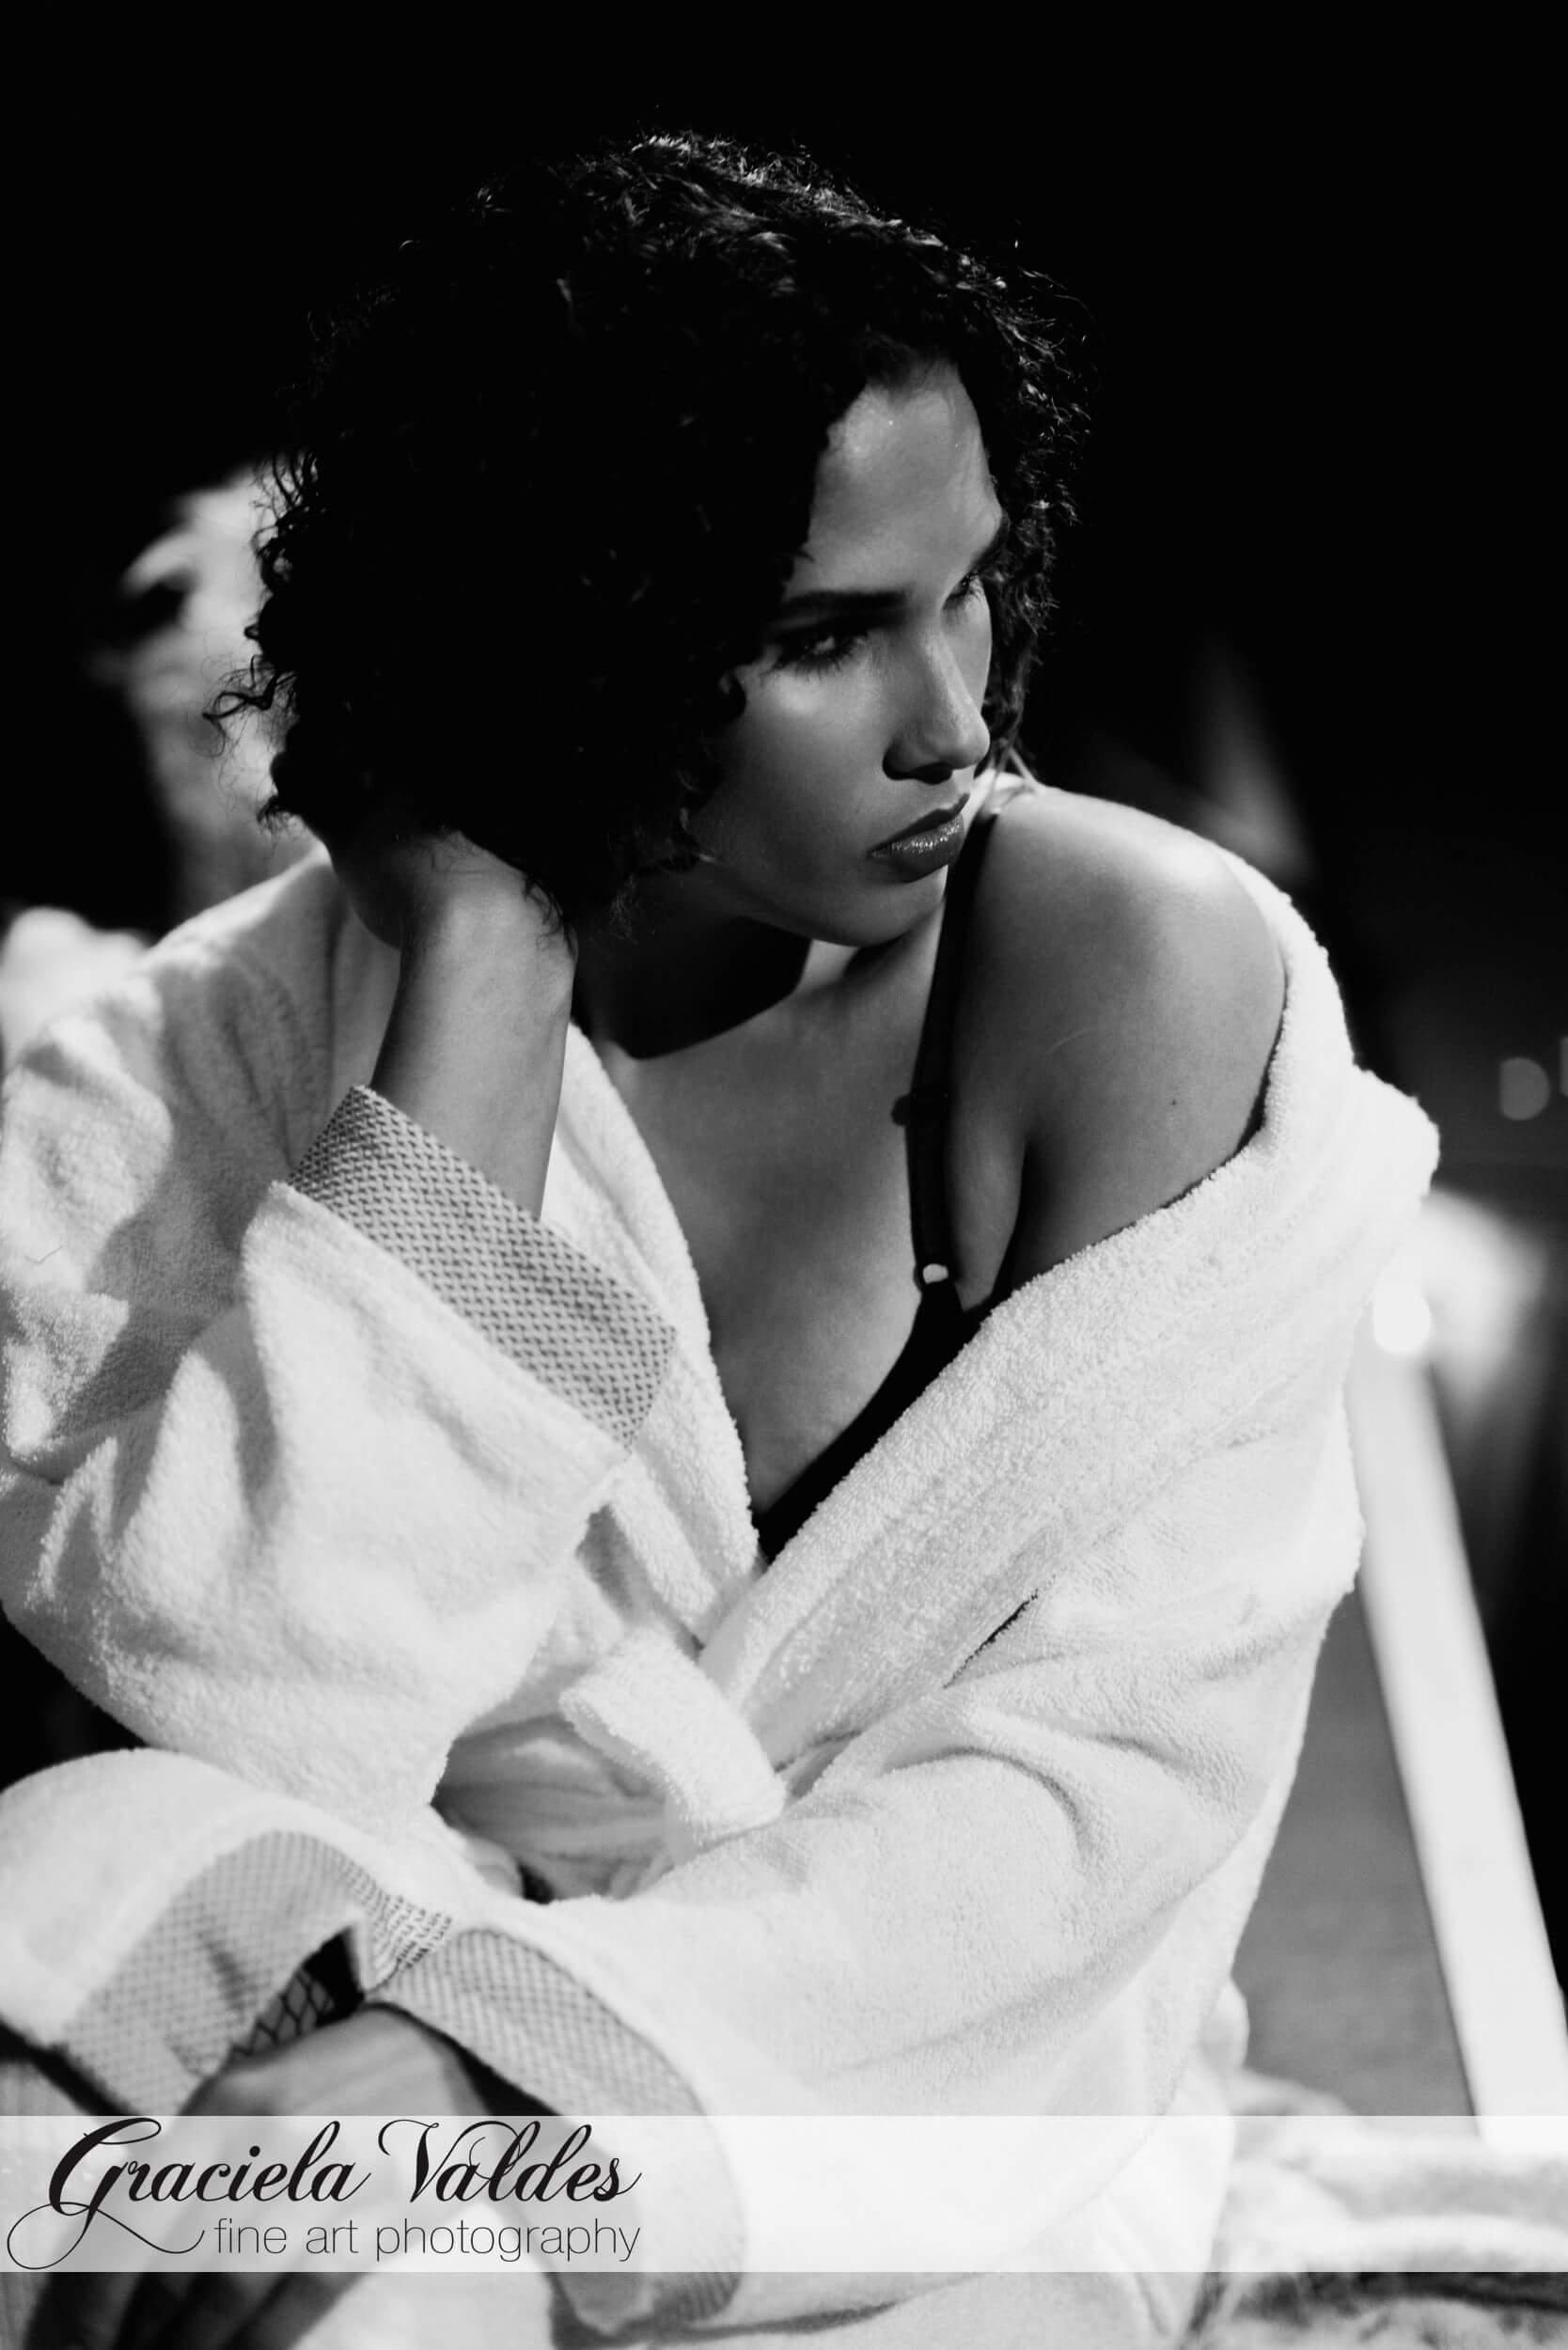 Sex After Dark by Graciela Valdes 64.jpg